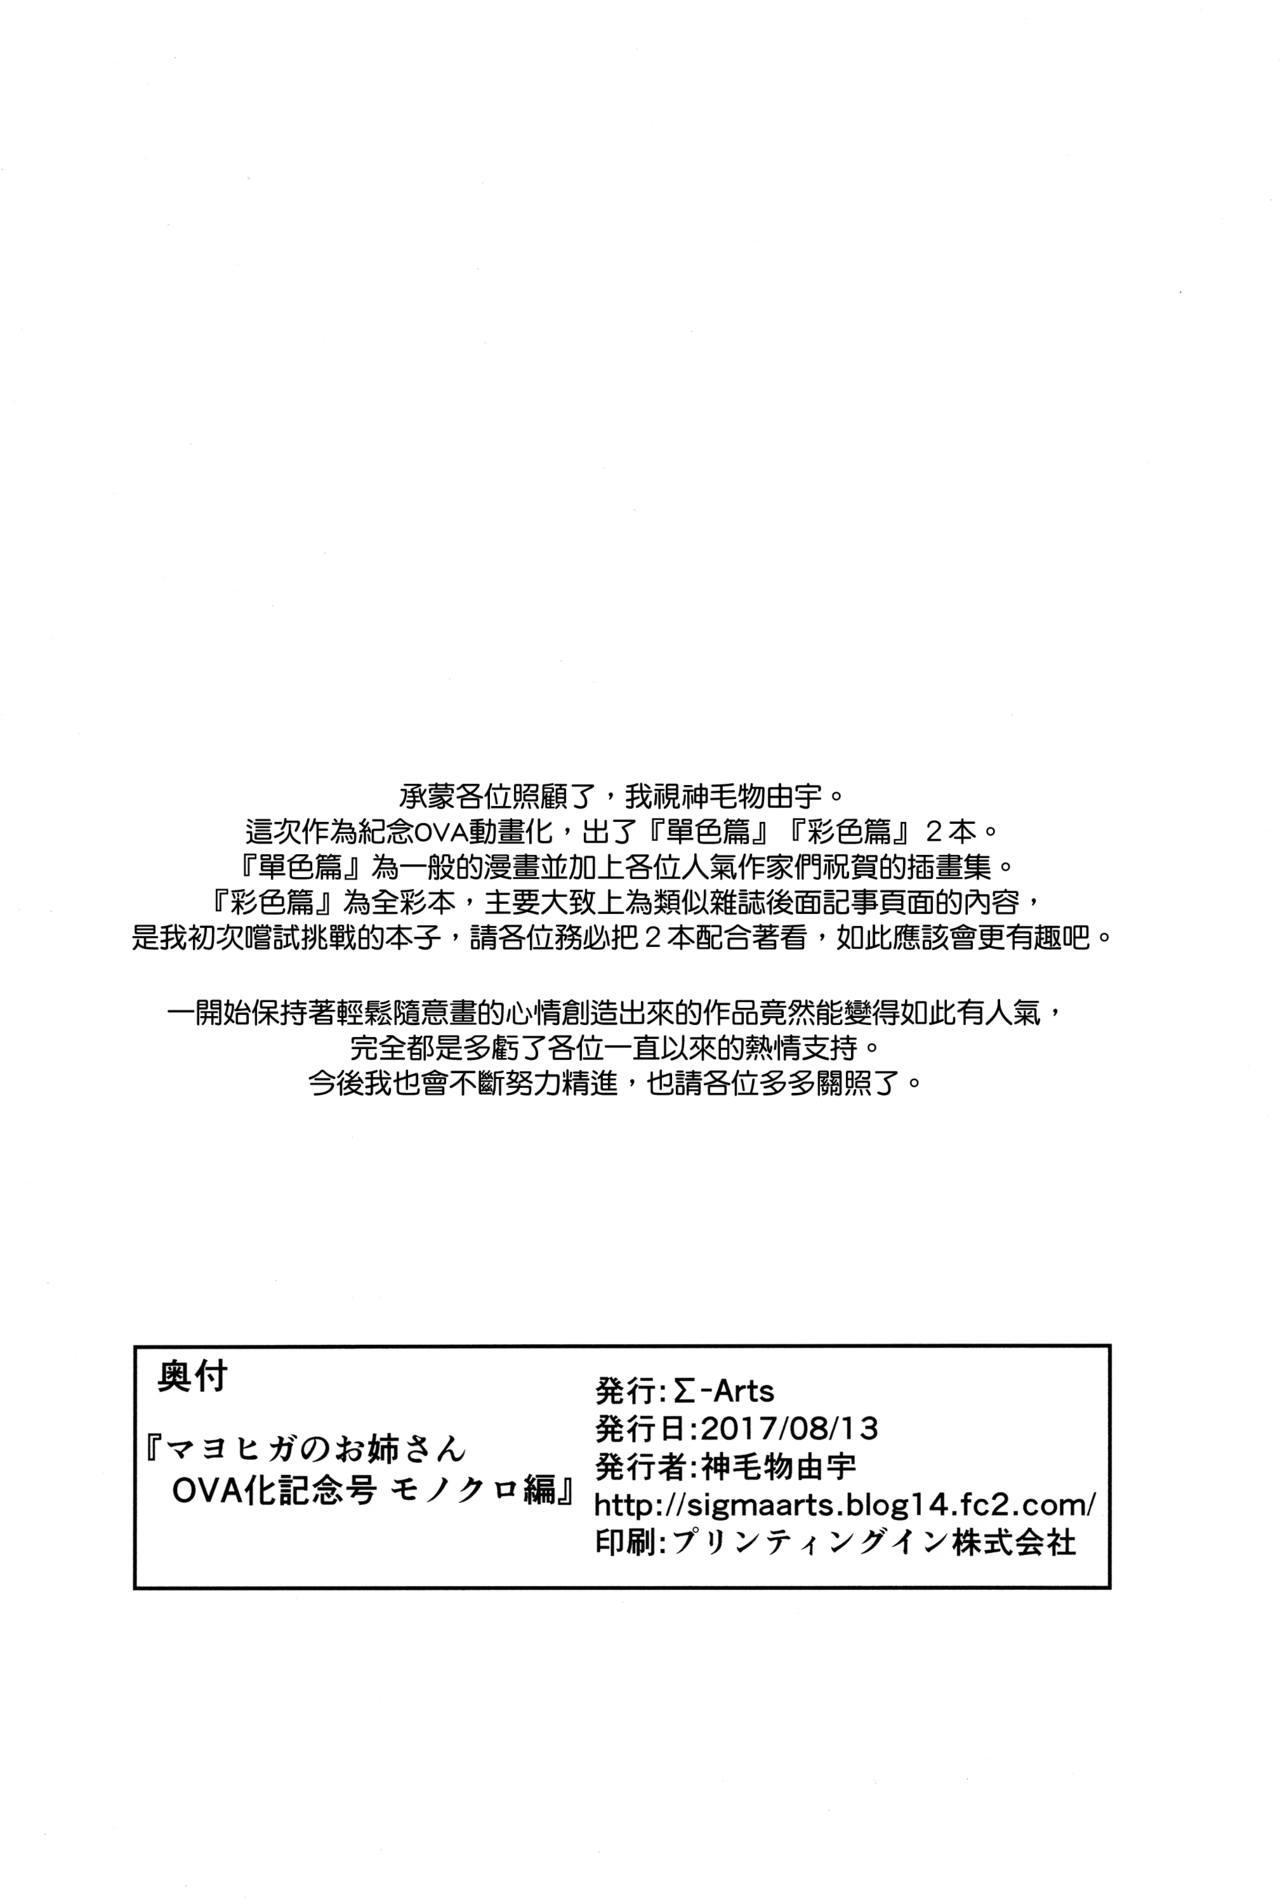 (C92) [Σ-Arts (Mikemono Yuu)] Mayoiga no Onee-san OVA-ka Kinengou Monochro Hen [Chinese] [无毒汉化组] 21